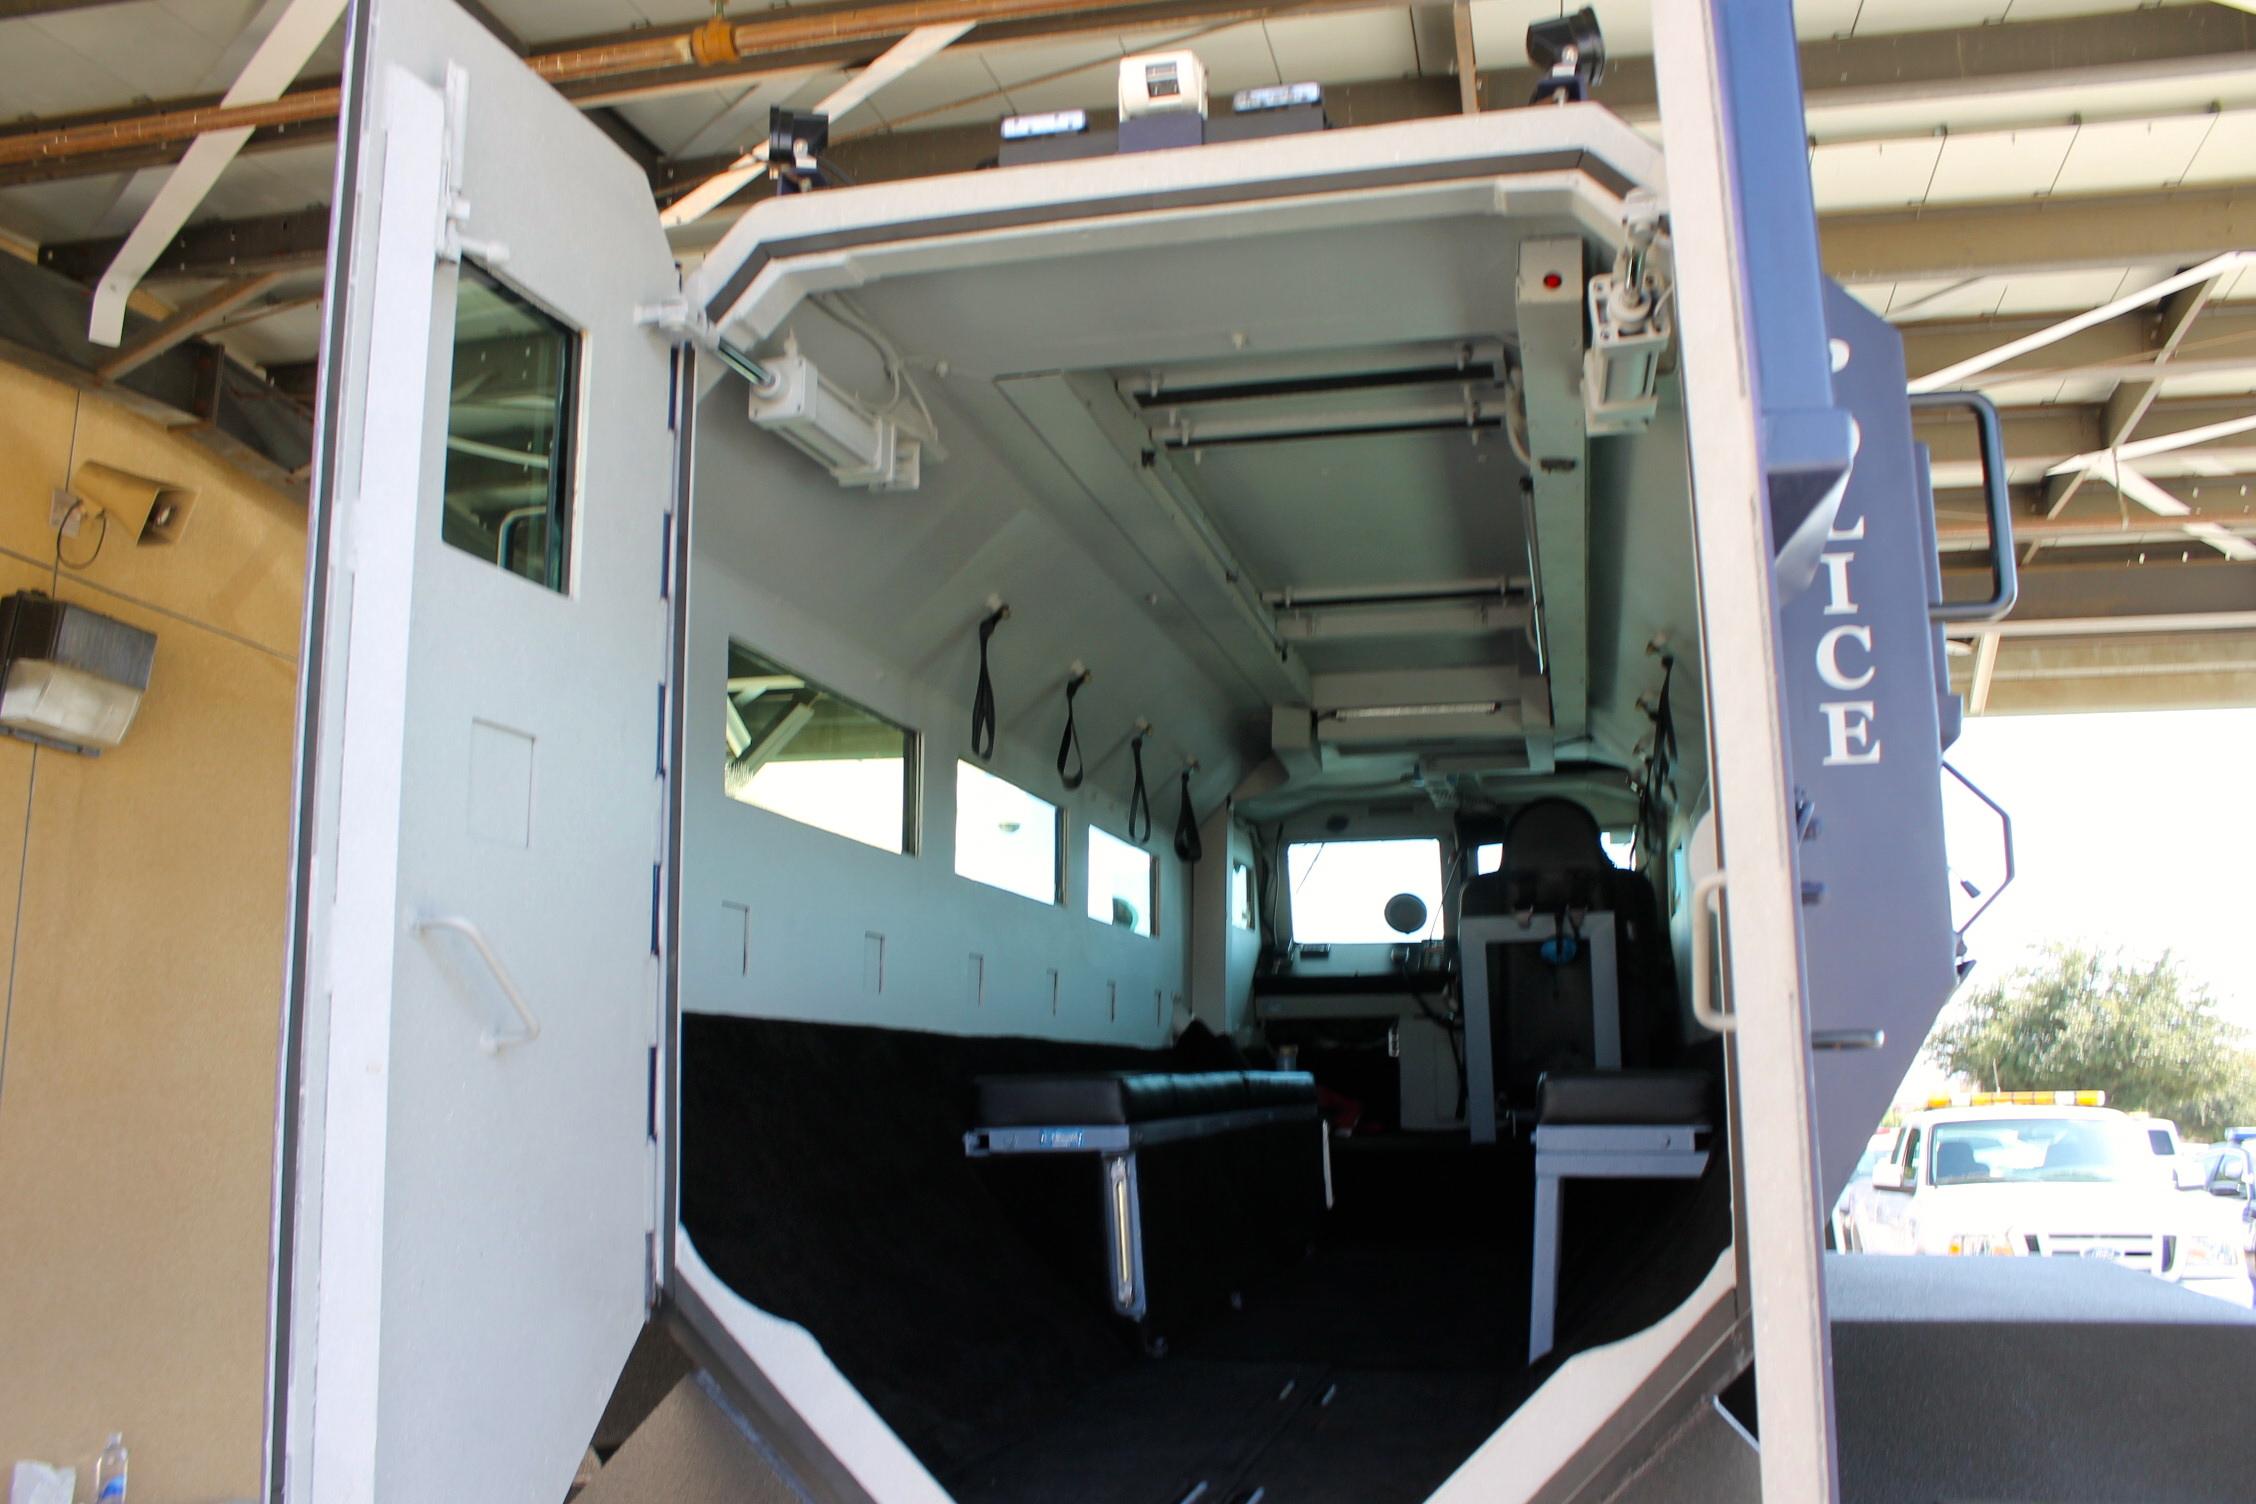 Murrieta Police Acquire New Armored SWAT Truck